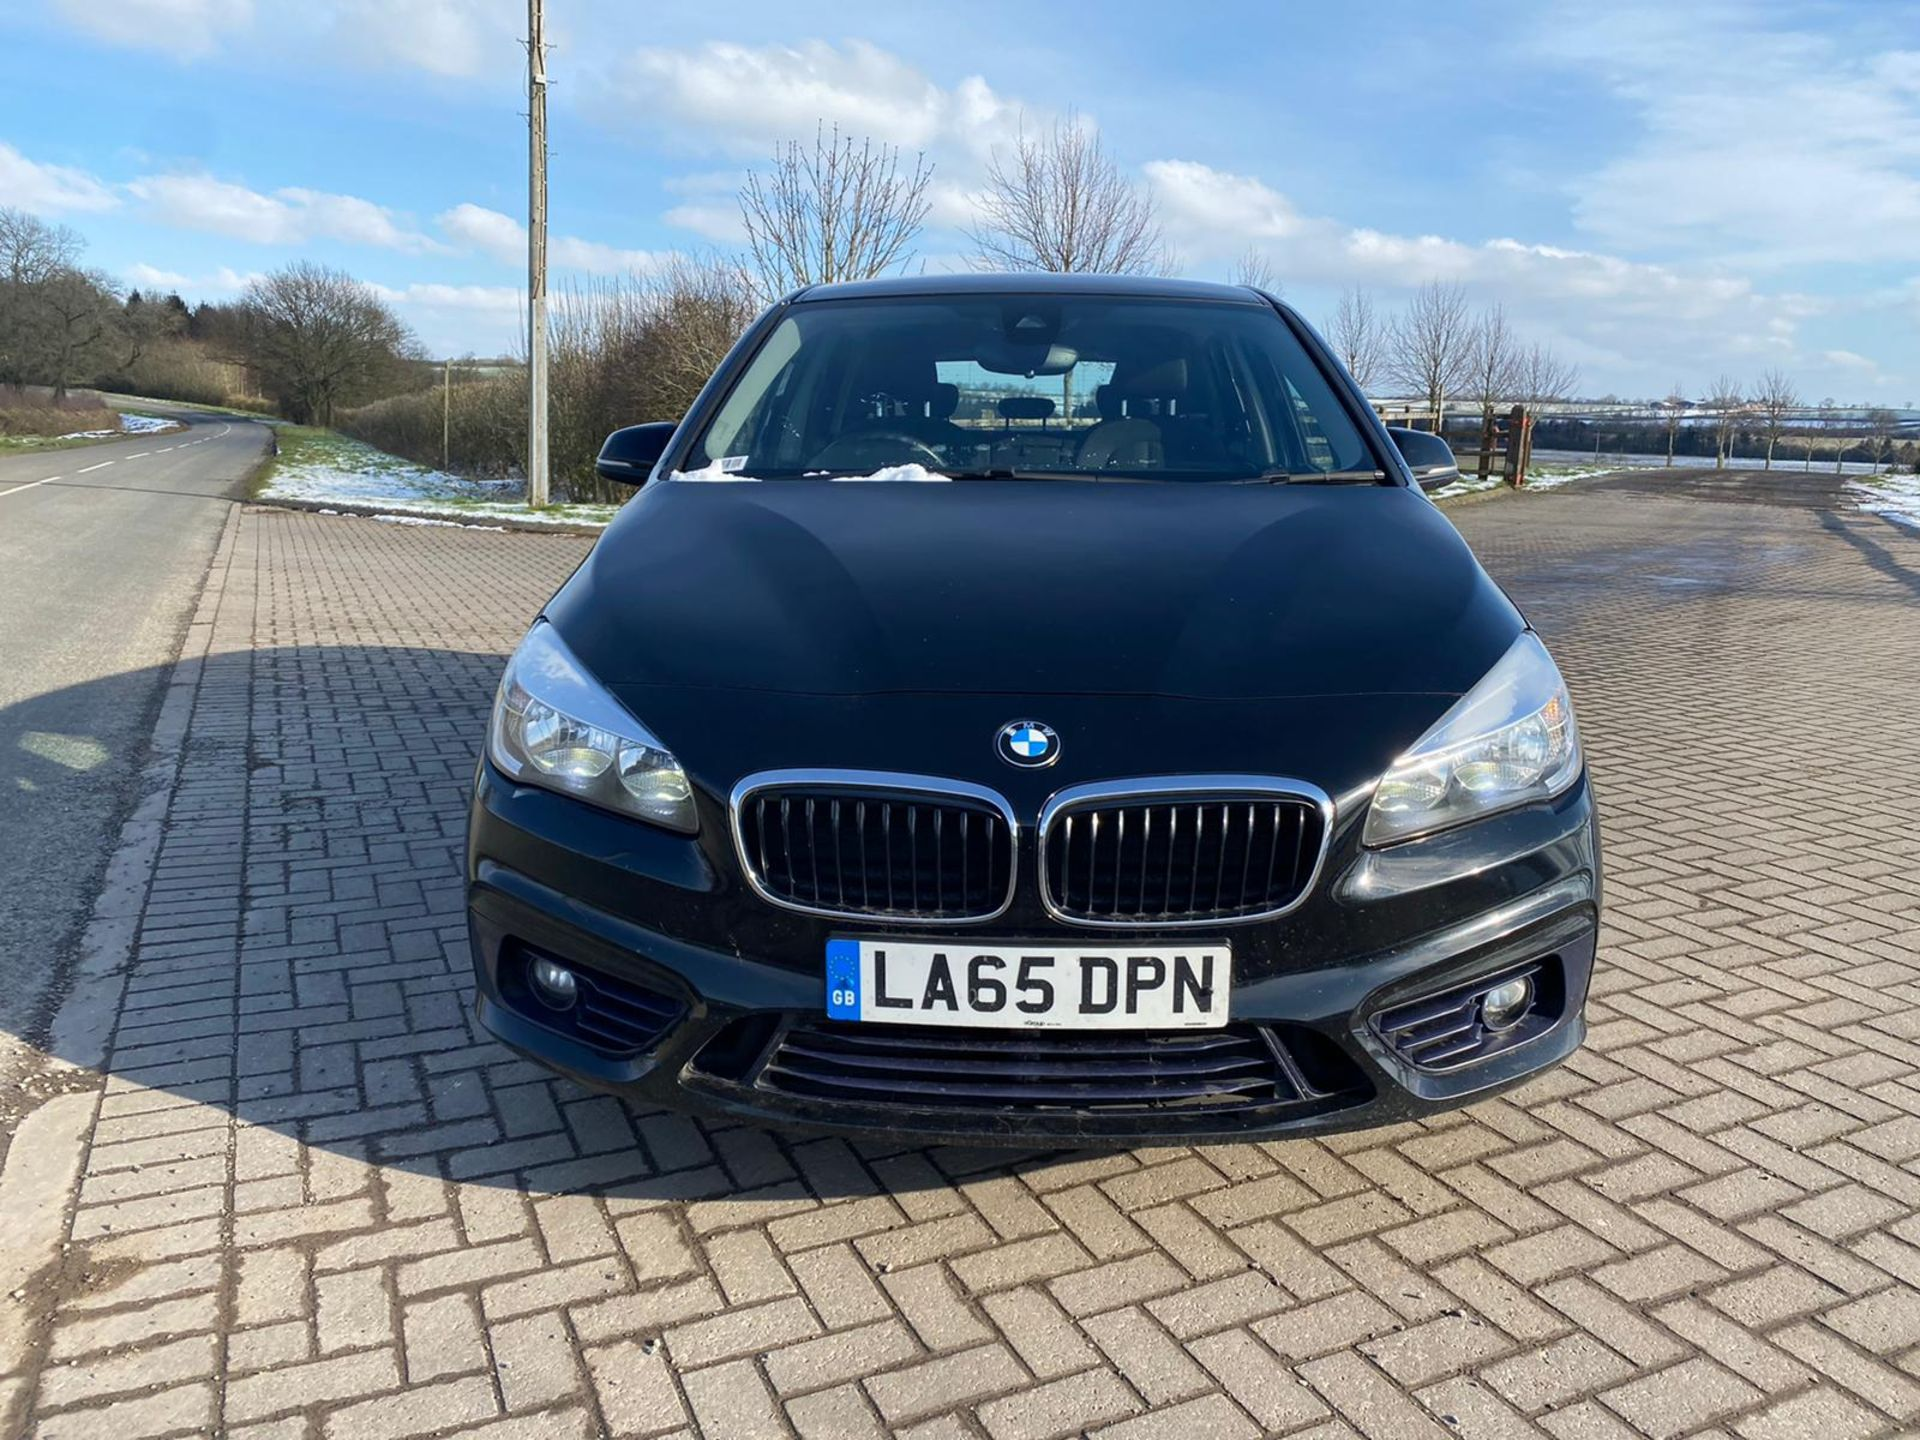 "ON SALE BMW 218d ""SPORT"" MPV 2.0 DIESEL ""EURO 6"" (2016 REG) - 1 OWNER - GREAT SPEC - BLACK - LOOK!! - Image 5 of 16"